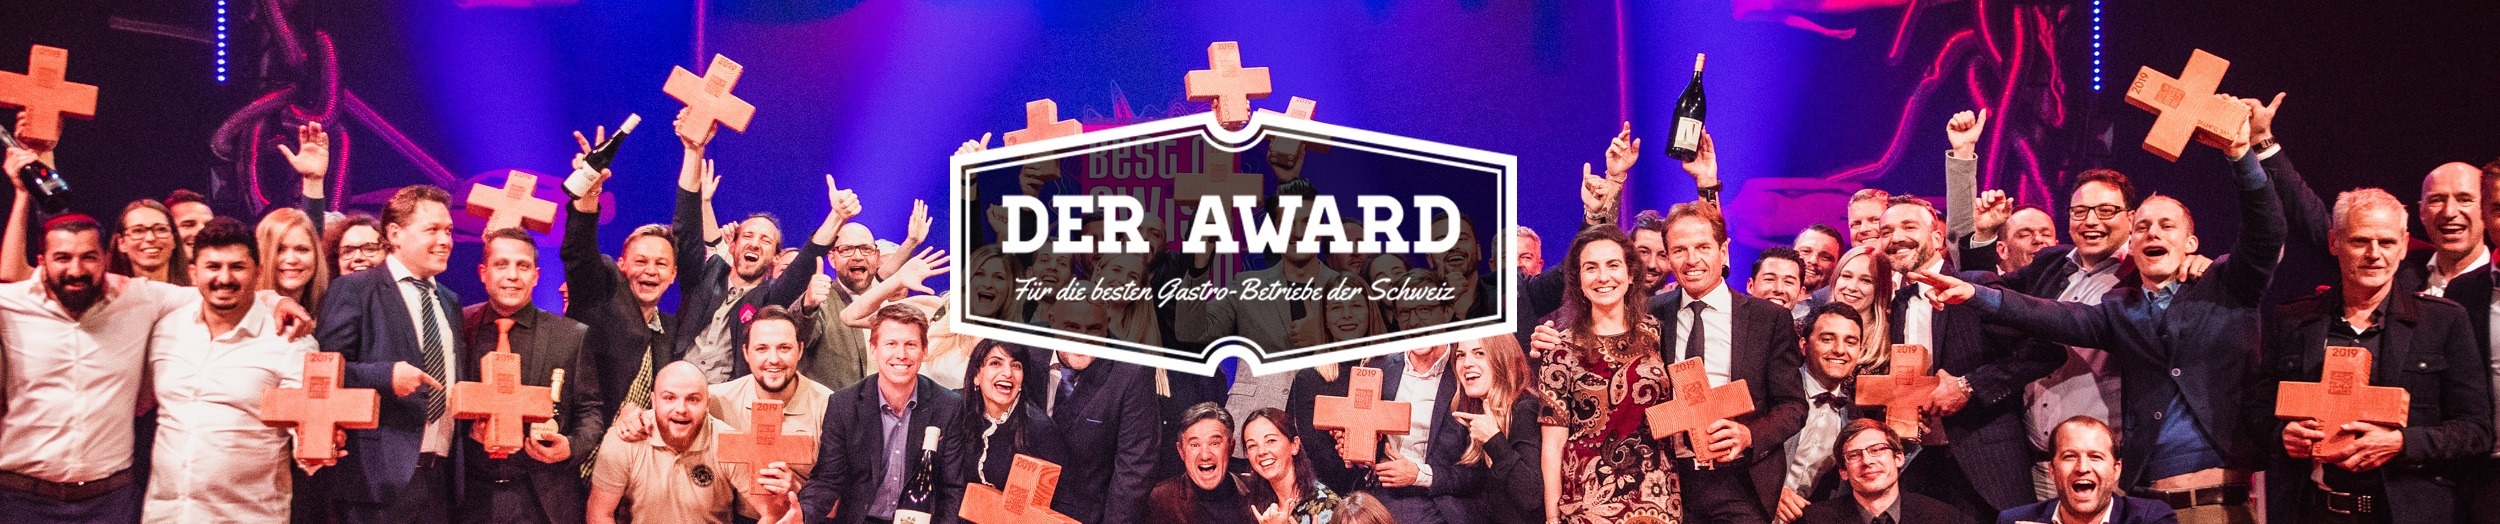 gewinner-header-2018-xl.jpg